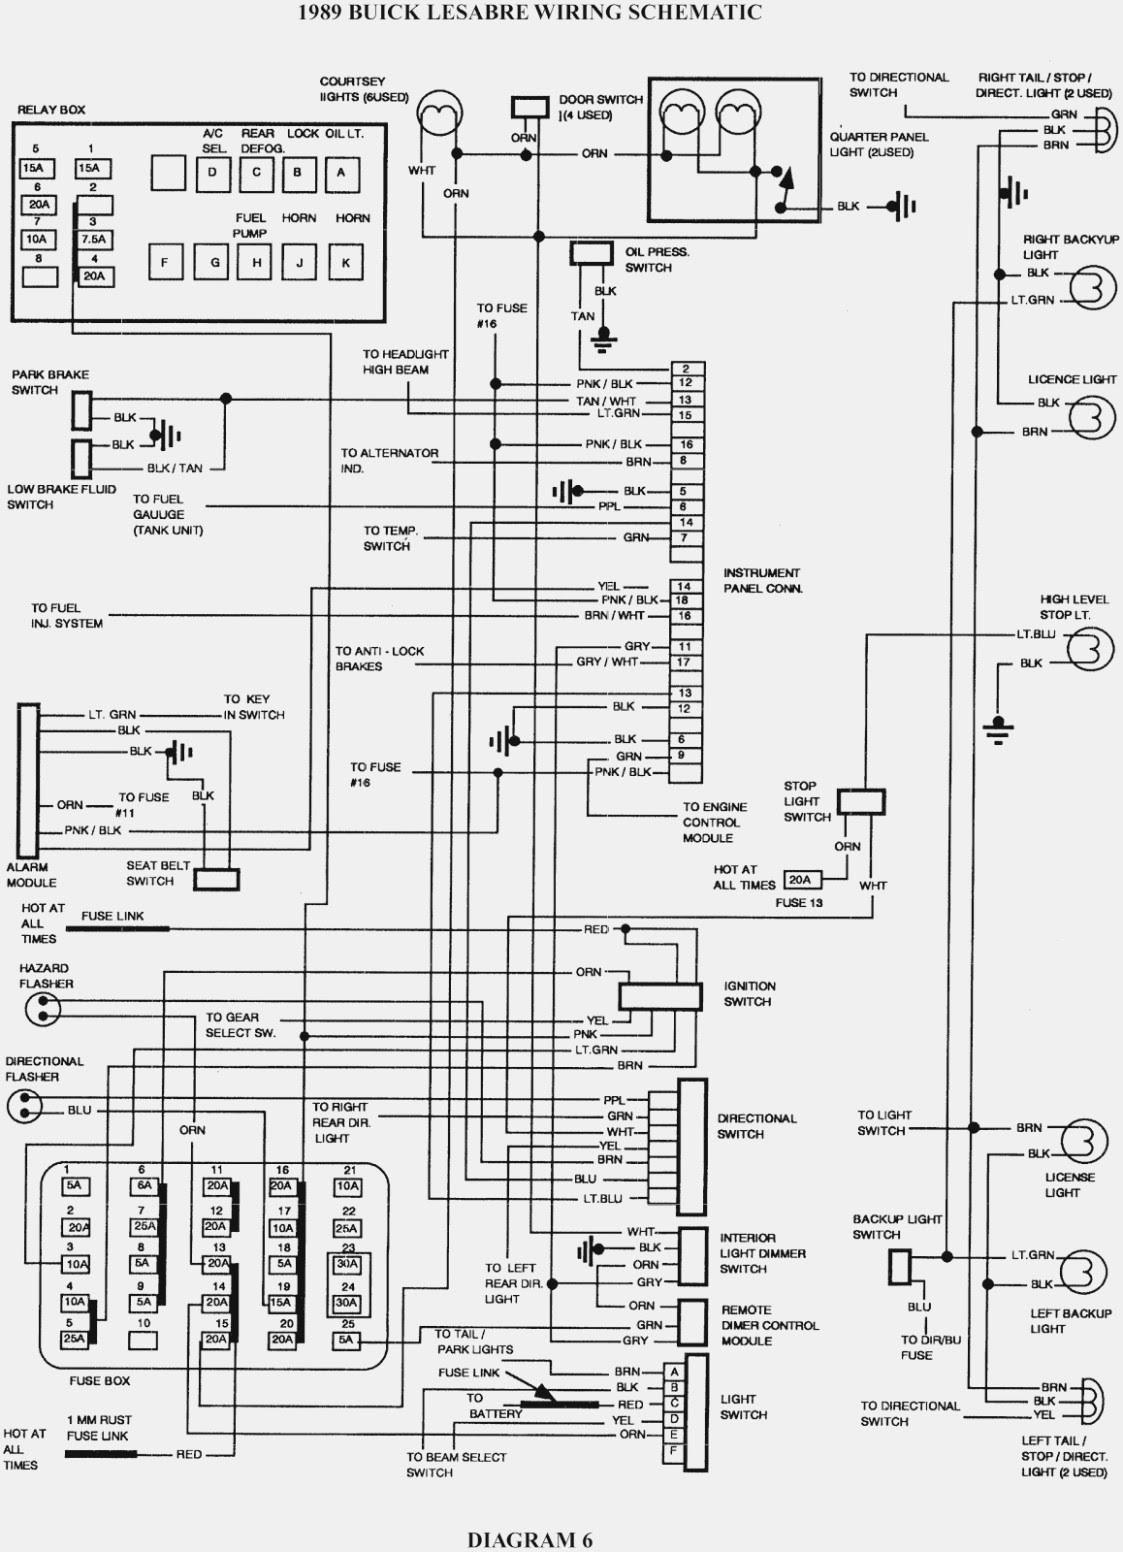 Buick Terraza Wiring Schematic Wiring Diagram Loan Day Loan Day Emilia Fise It